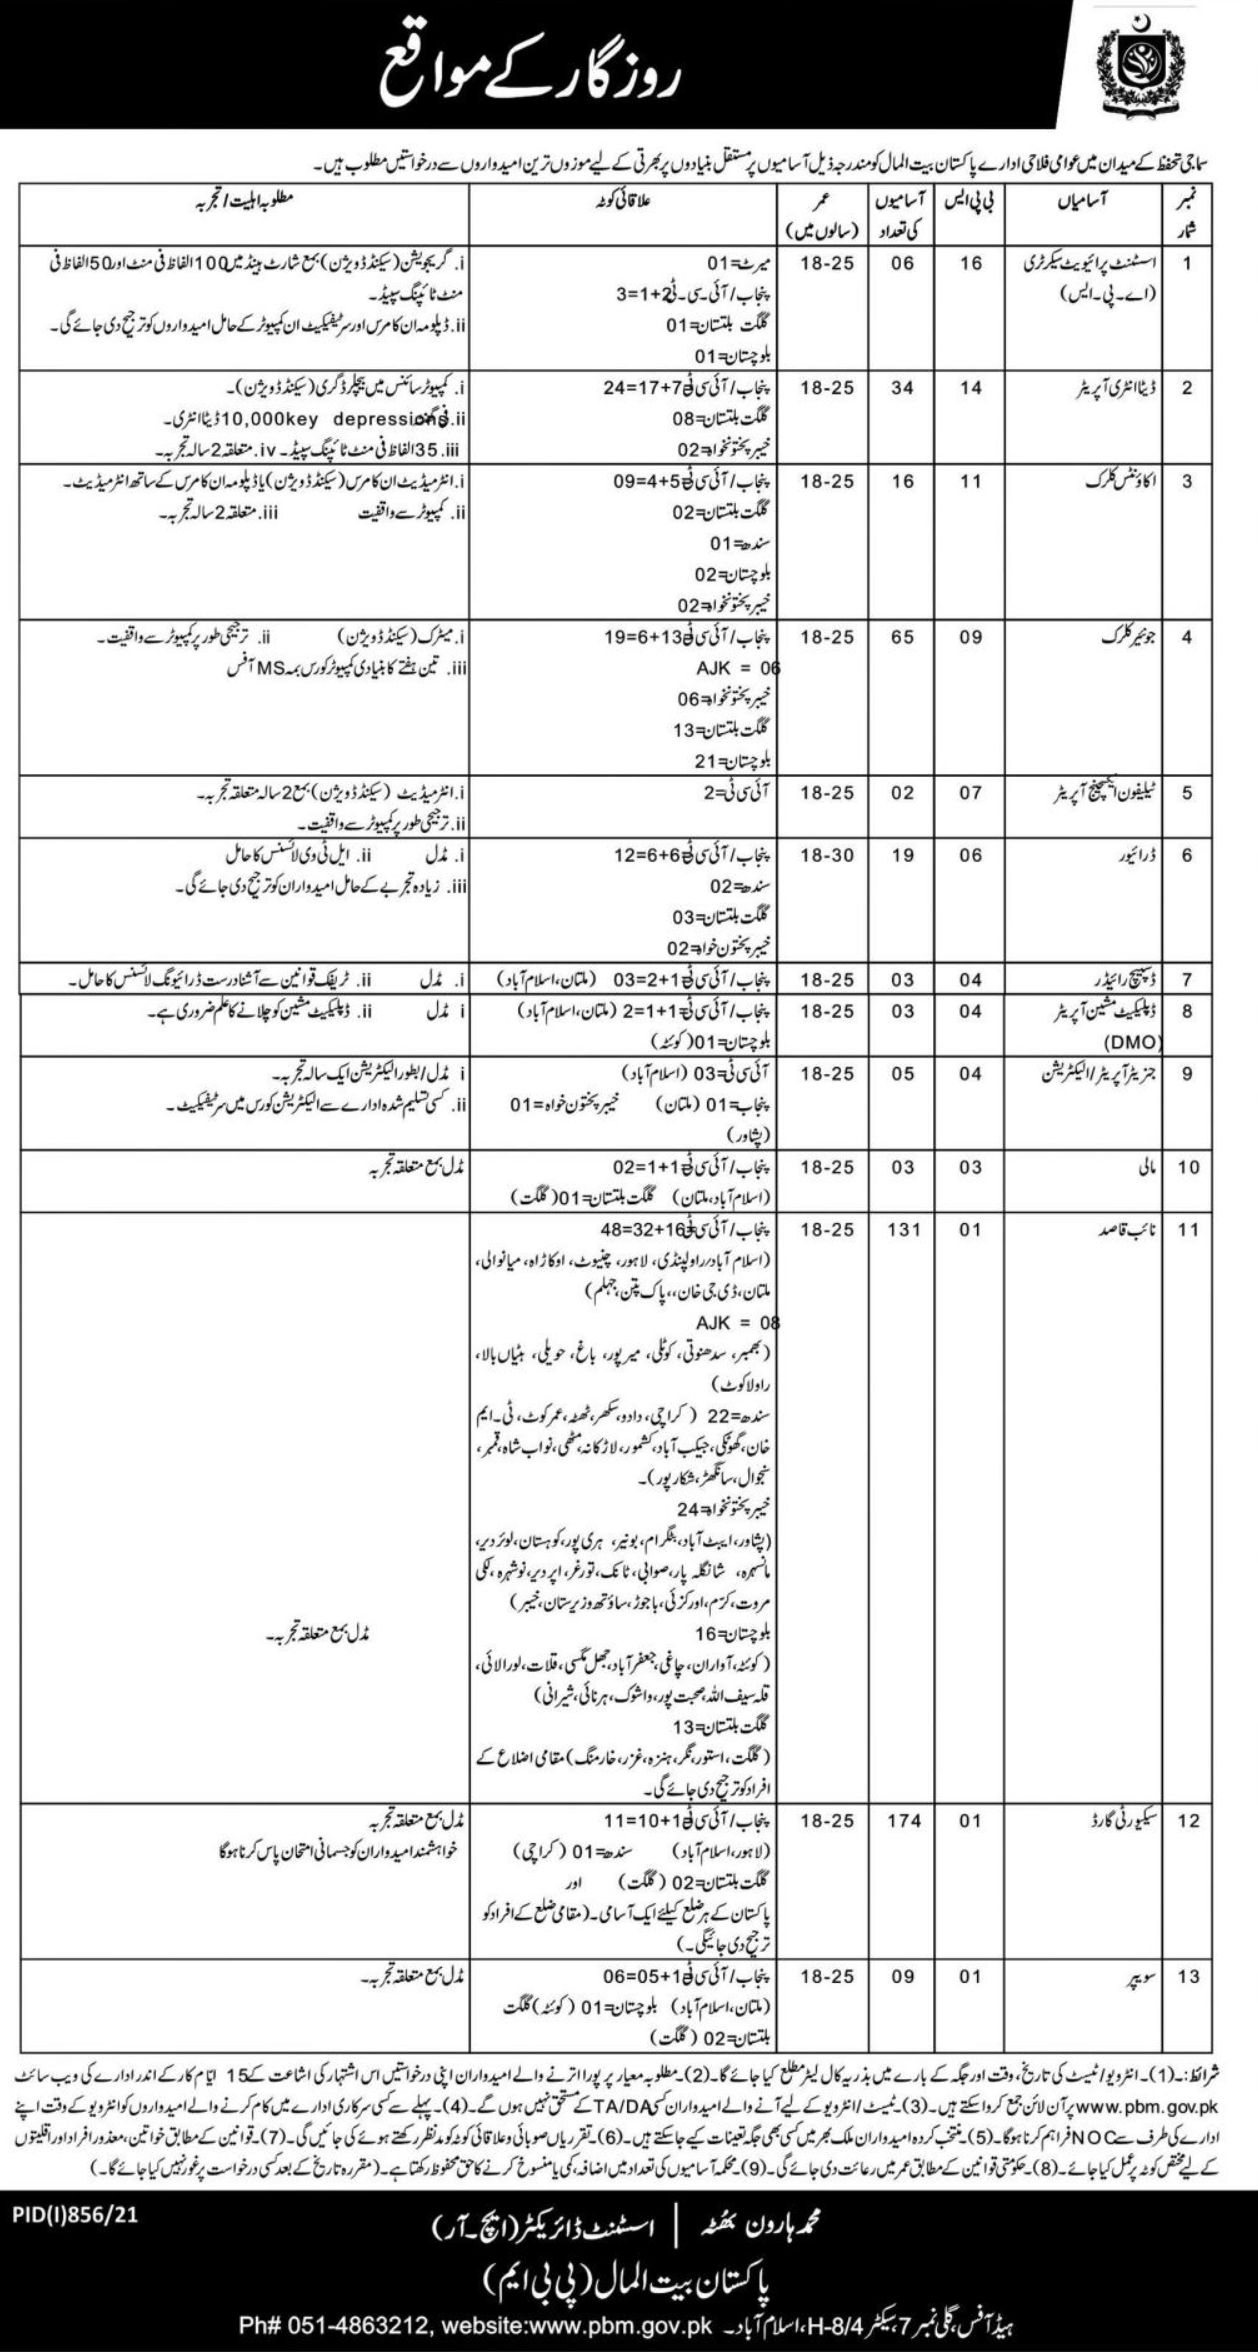 Pakistan Baitul Mall Vacancies 2021 2